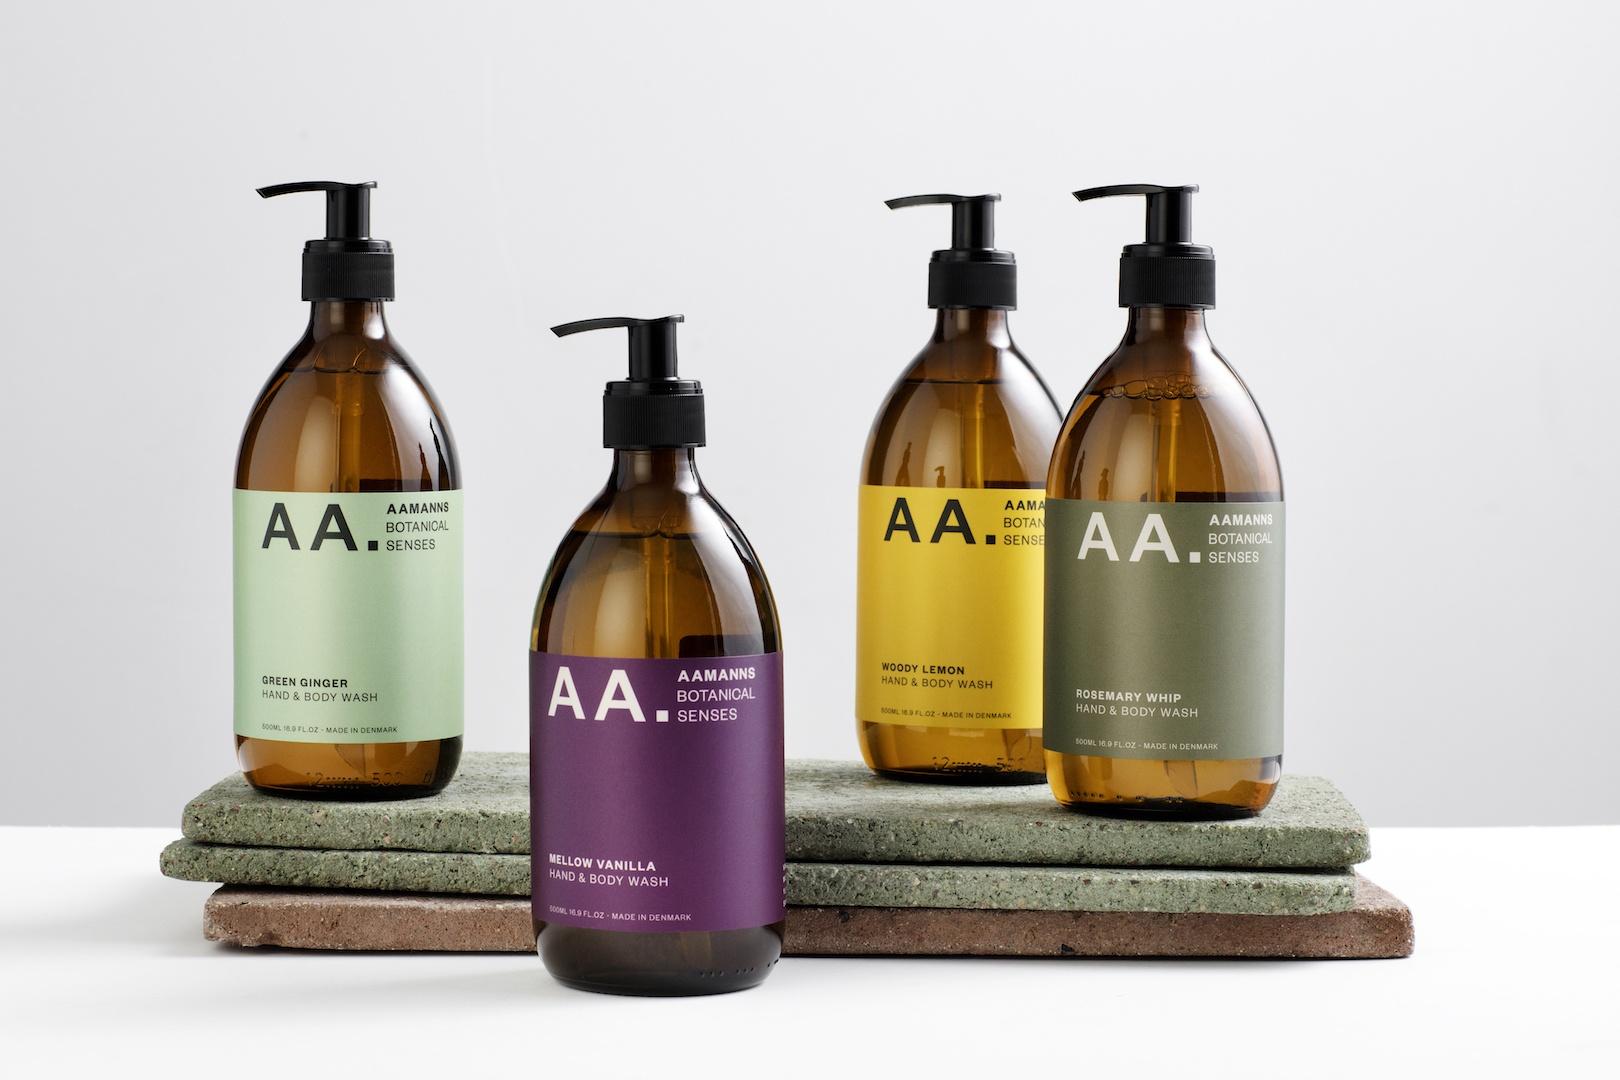 AA. Aamanns Botanical Senses